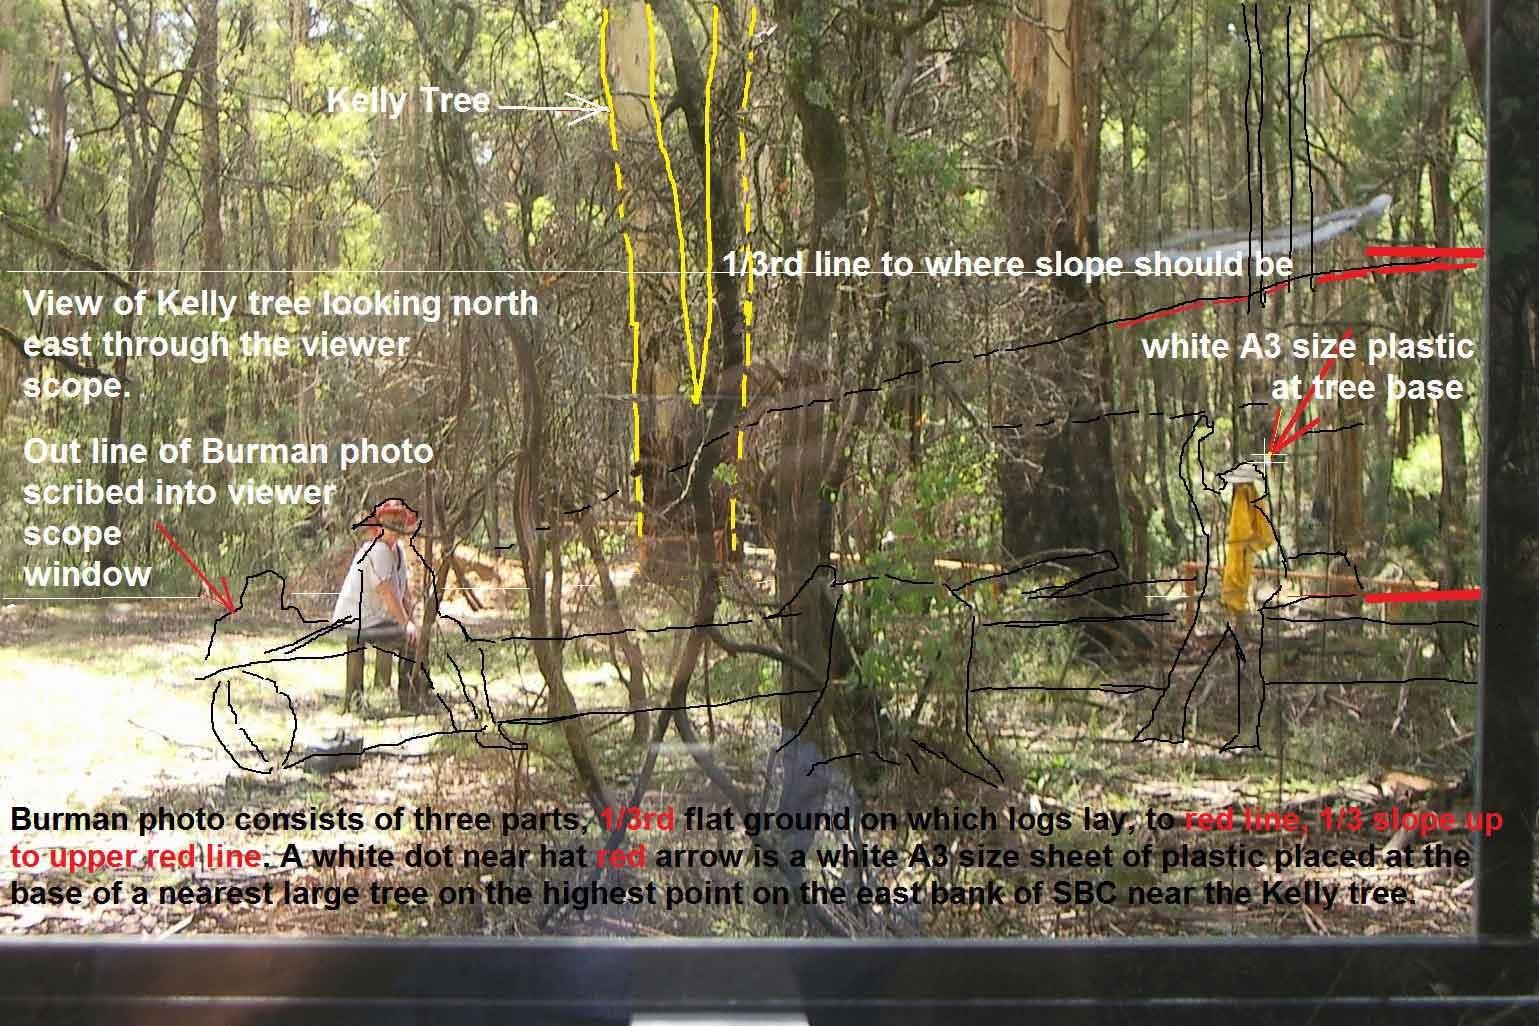 orientation of burman photos at sbc - Page 4 Viewerscopekellytree7953